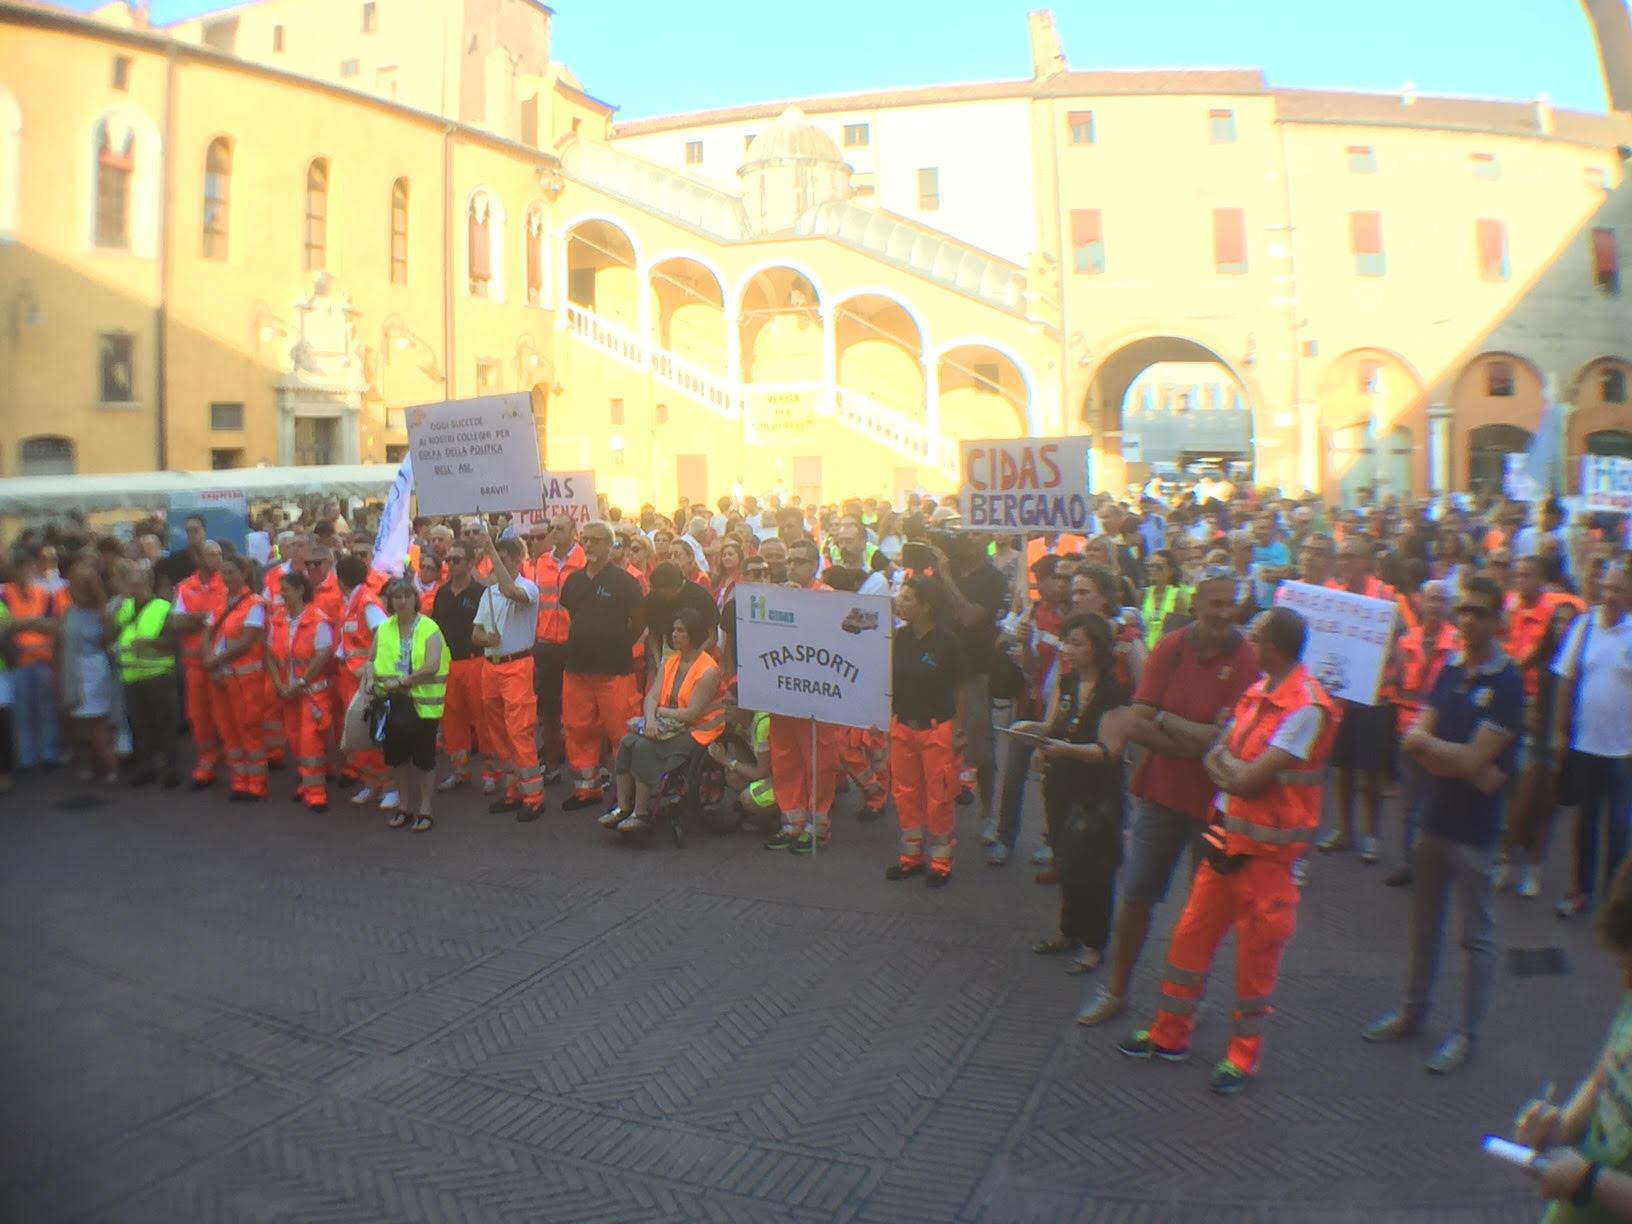 Ferrara, CIDAS in piazza a difesa dei posti di lavoro nell'emergenza | Emergency Live 2